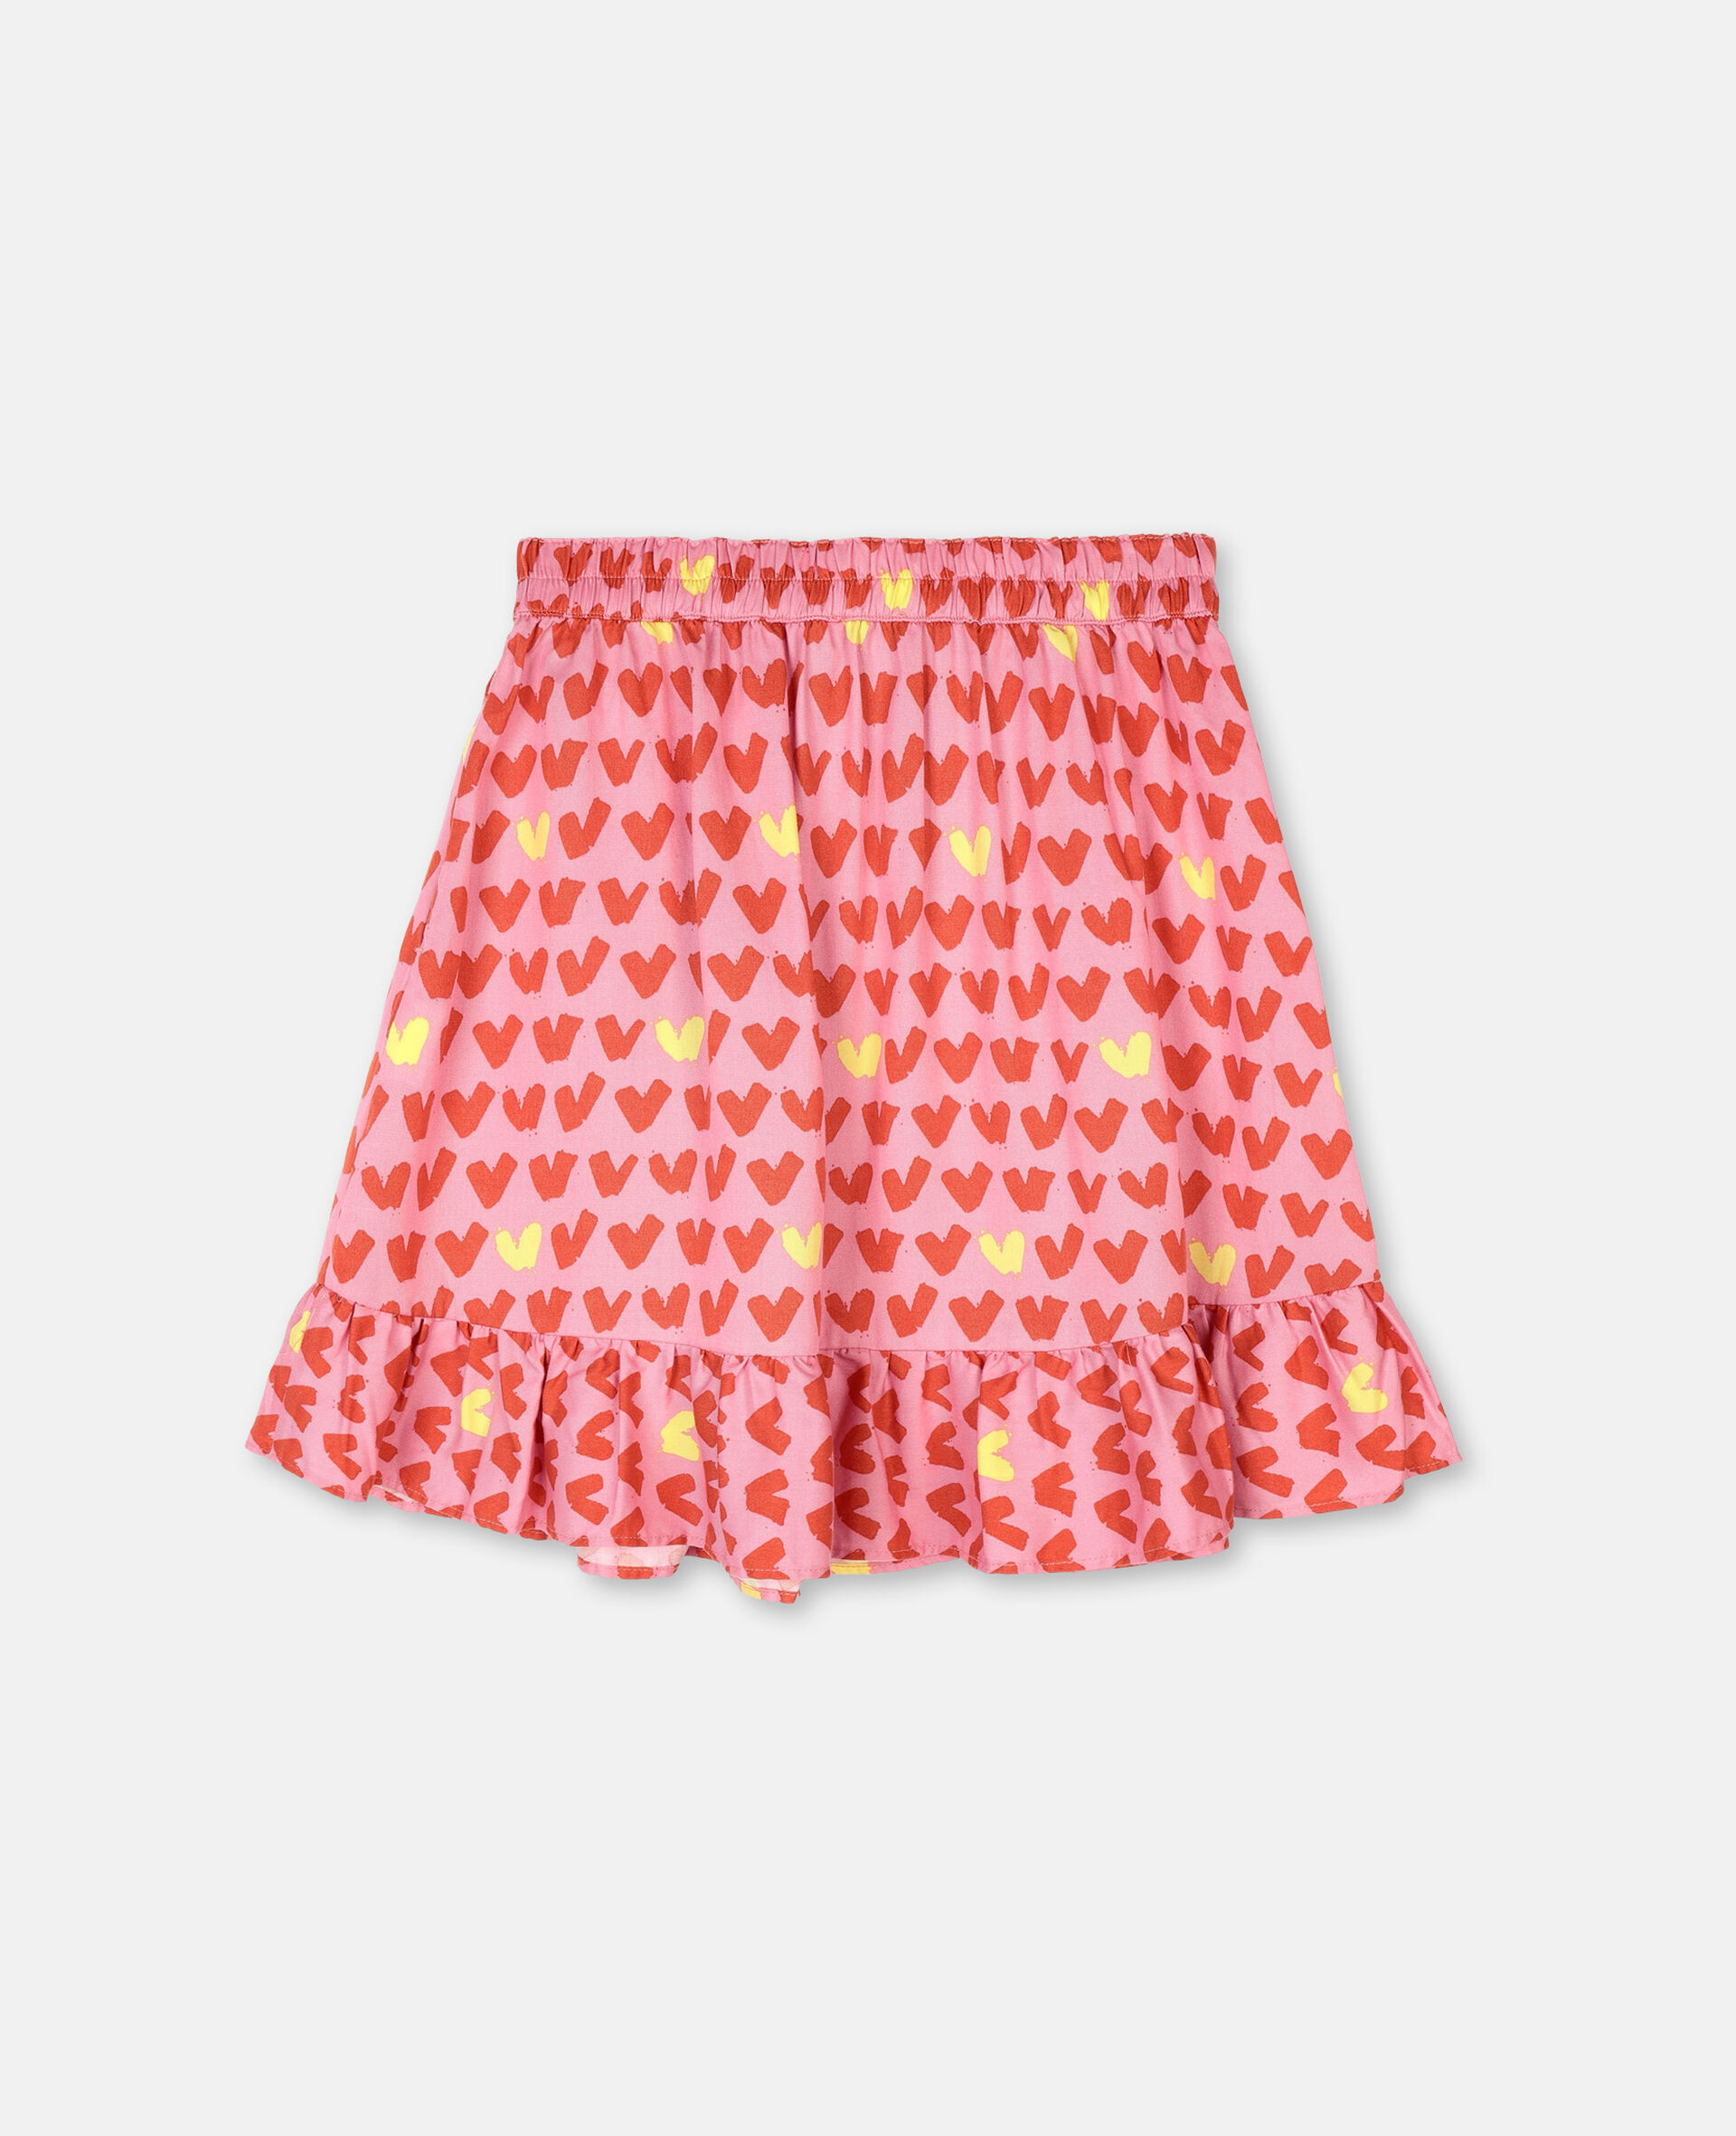 Hearts 粘胶纤维斜纹布半身裙 -粉色-large image number 3